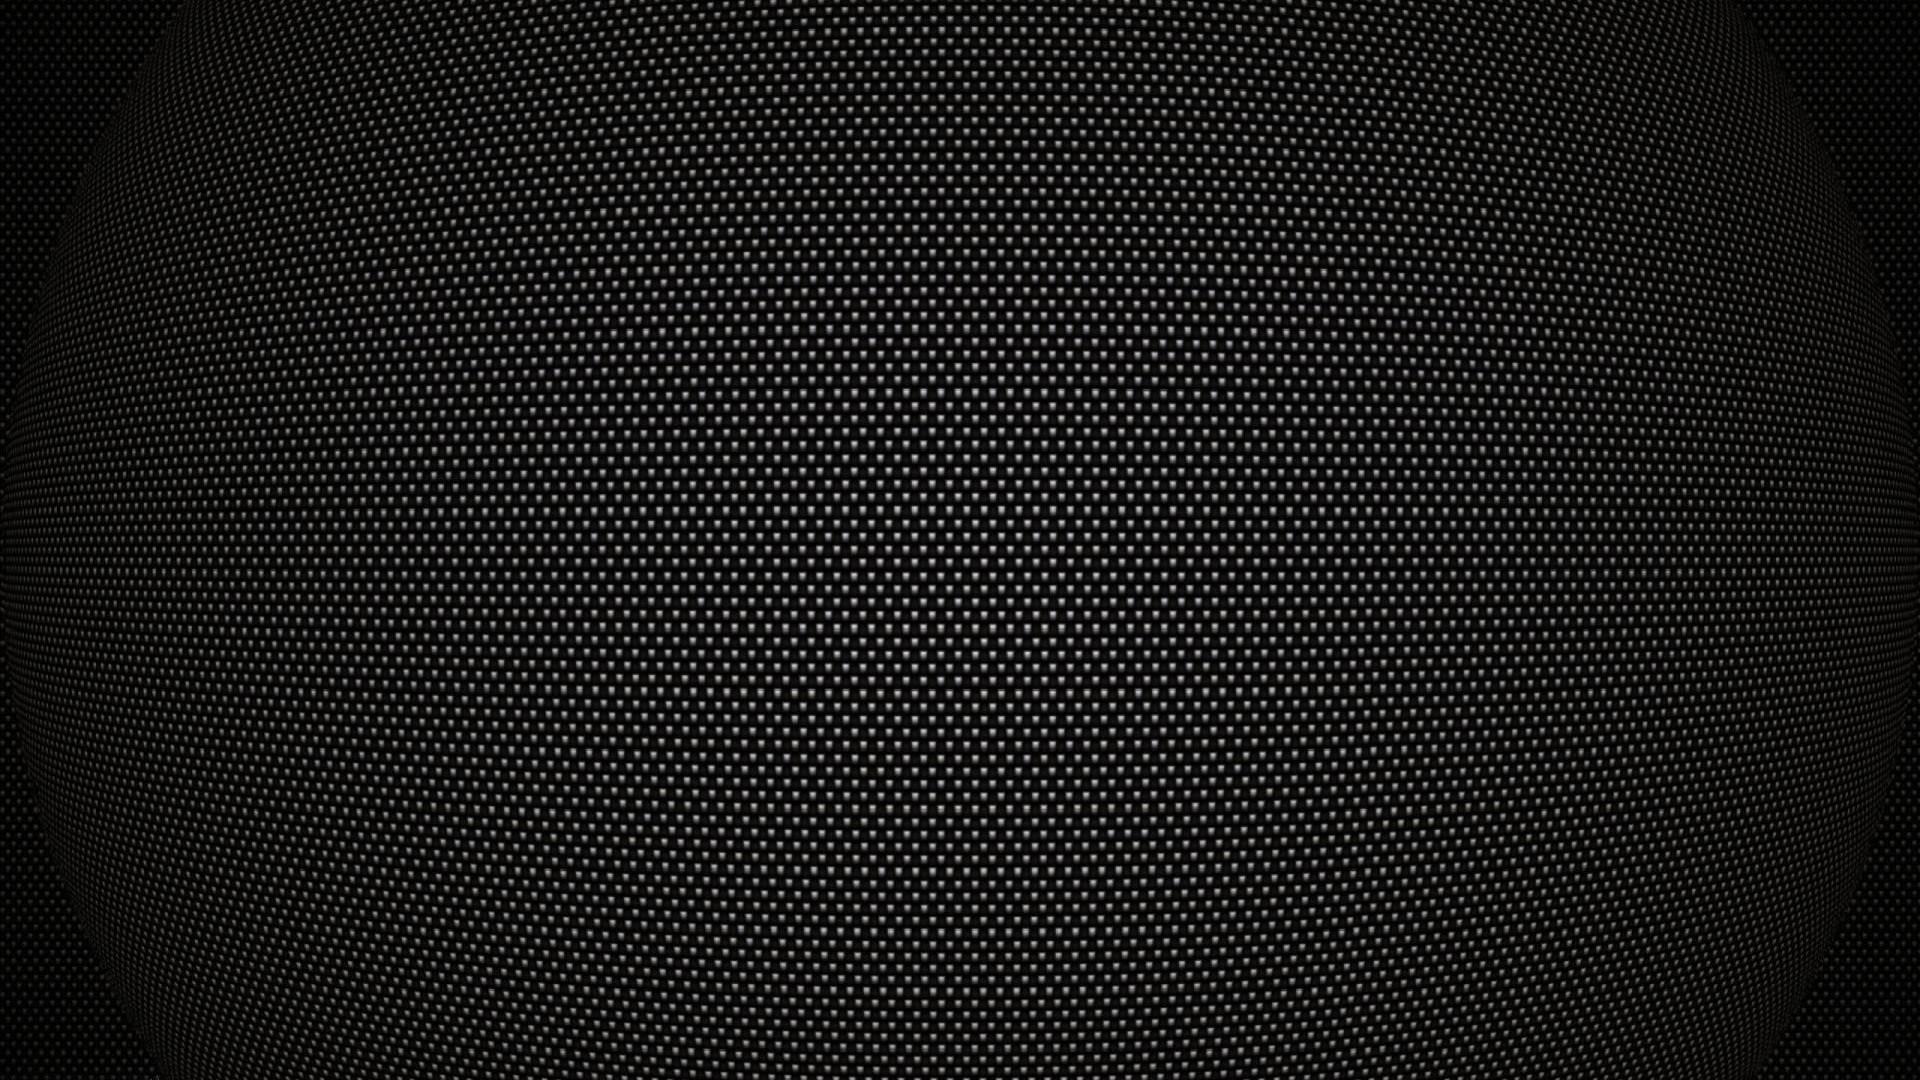 Plain Background Wallpaper 62 Pictures